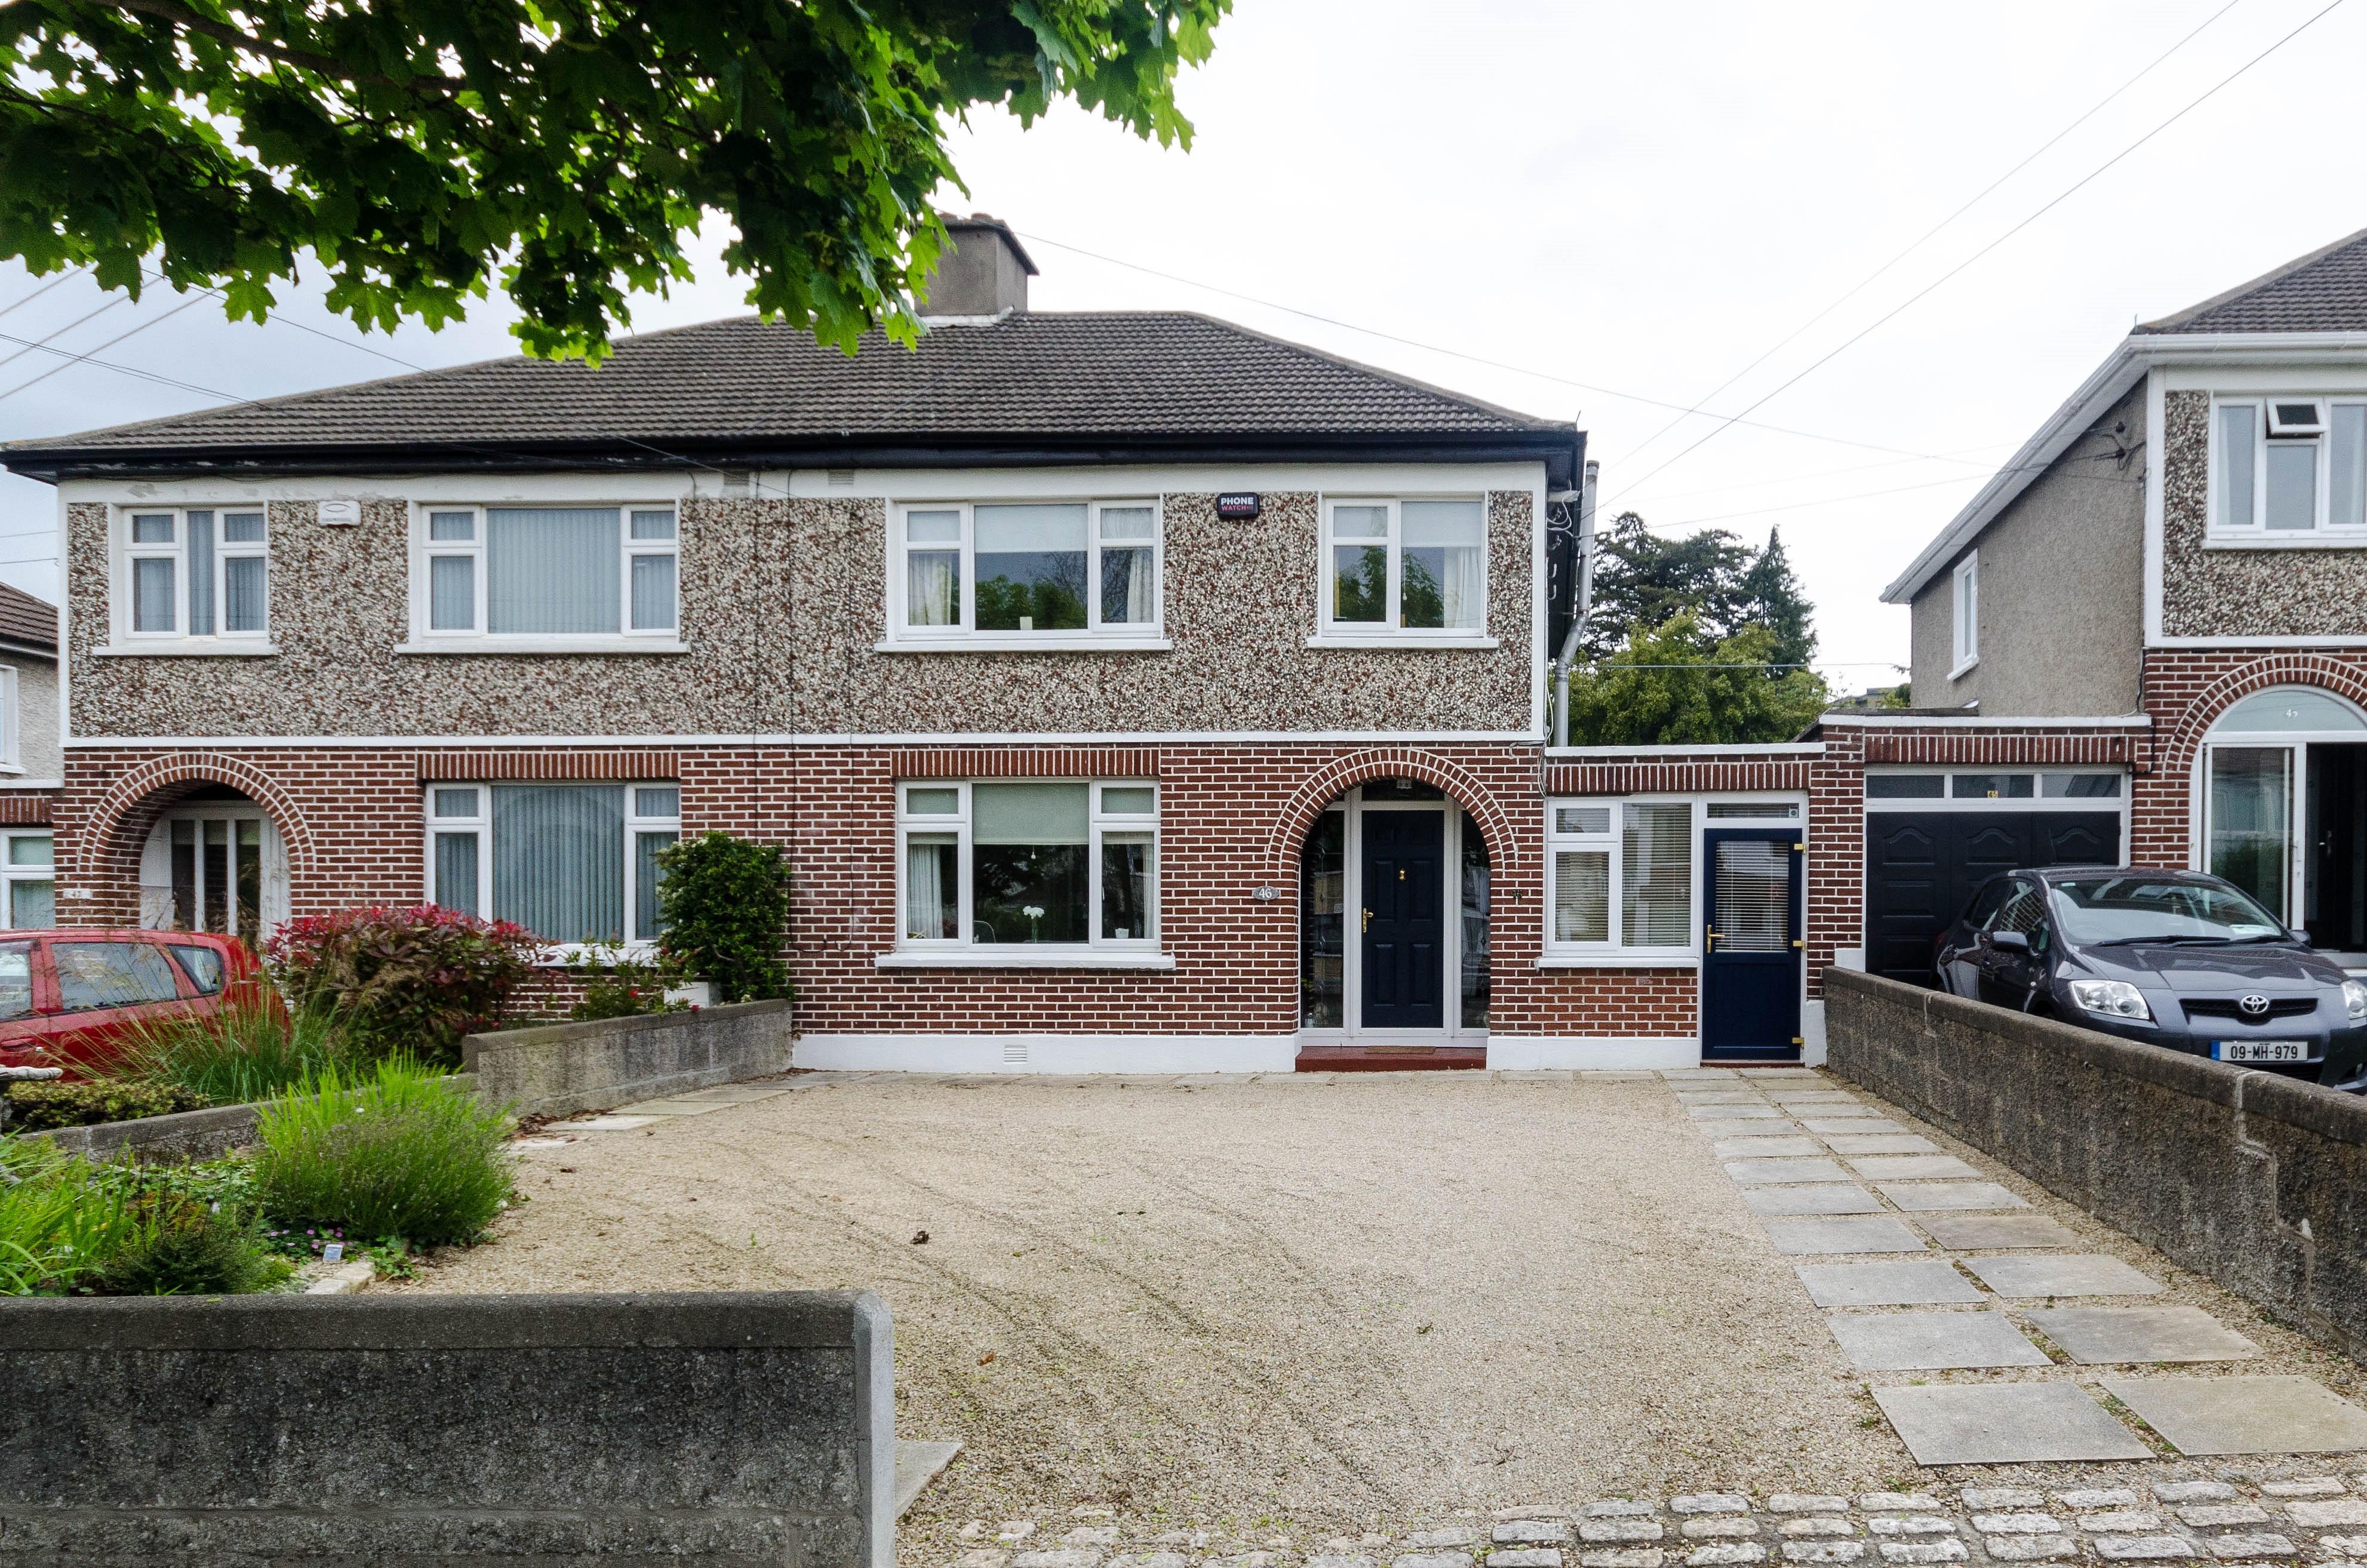 46 Granitefield, Dun Laoghaire, Co Dublin